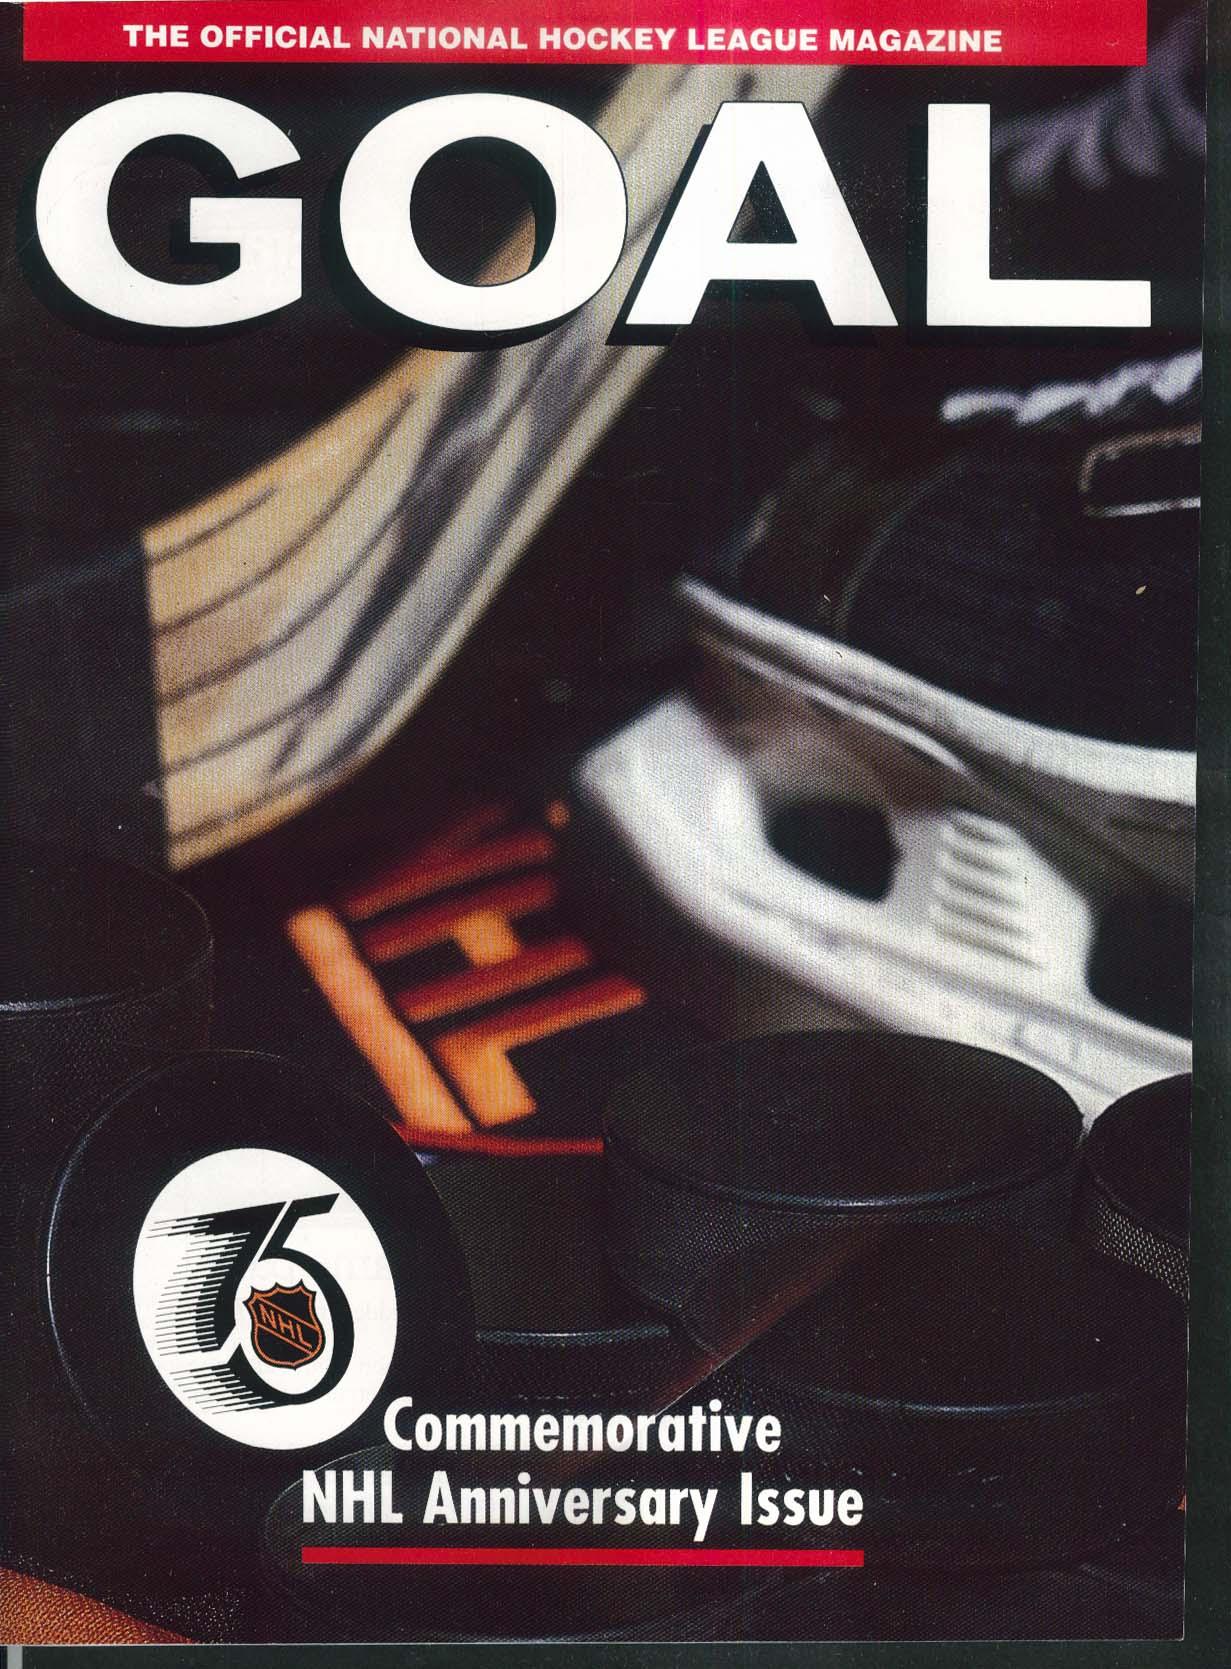 GOAL Hartford Whalers v Montreal Canadiens 10/8 1991